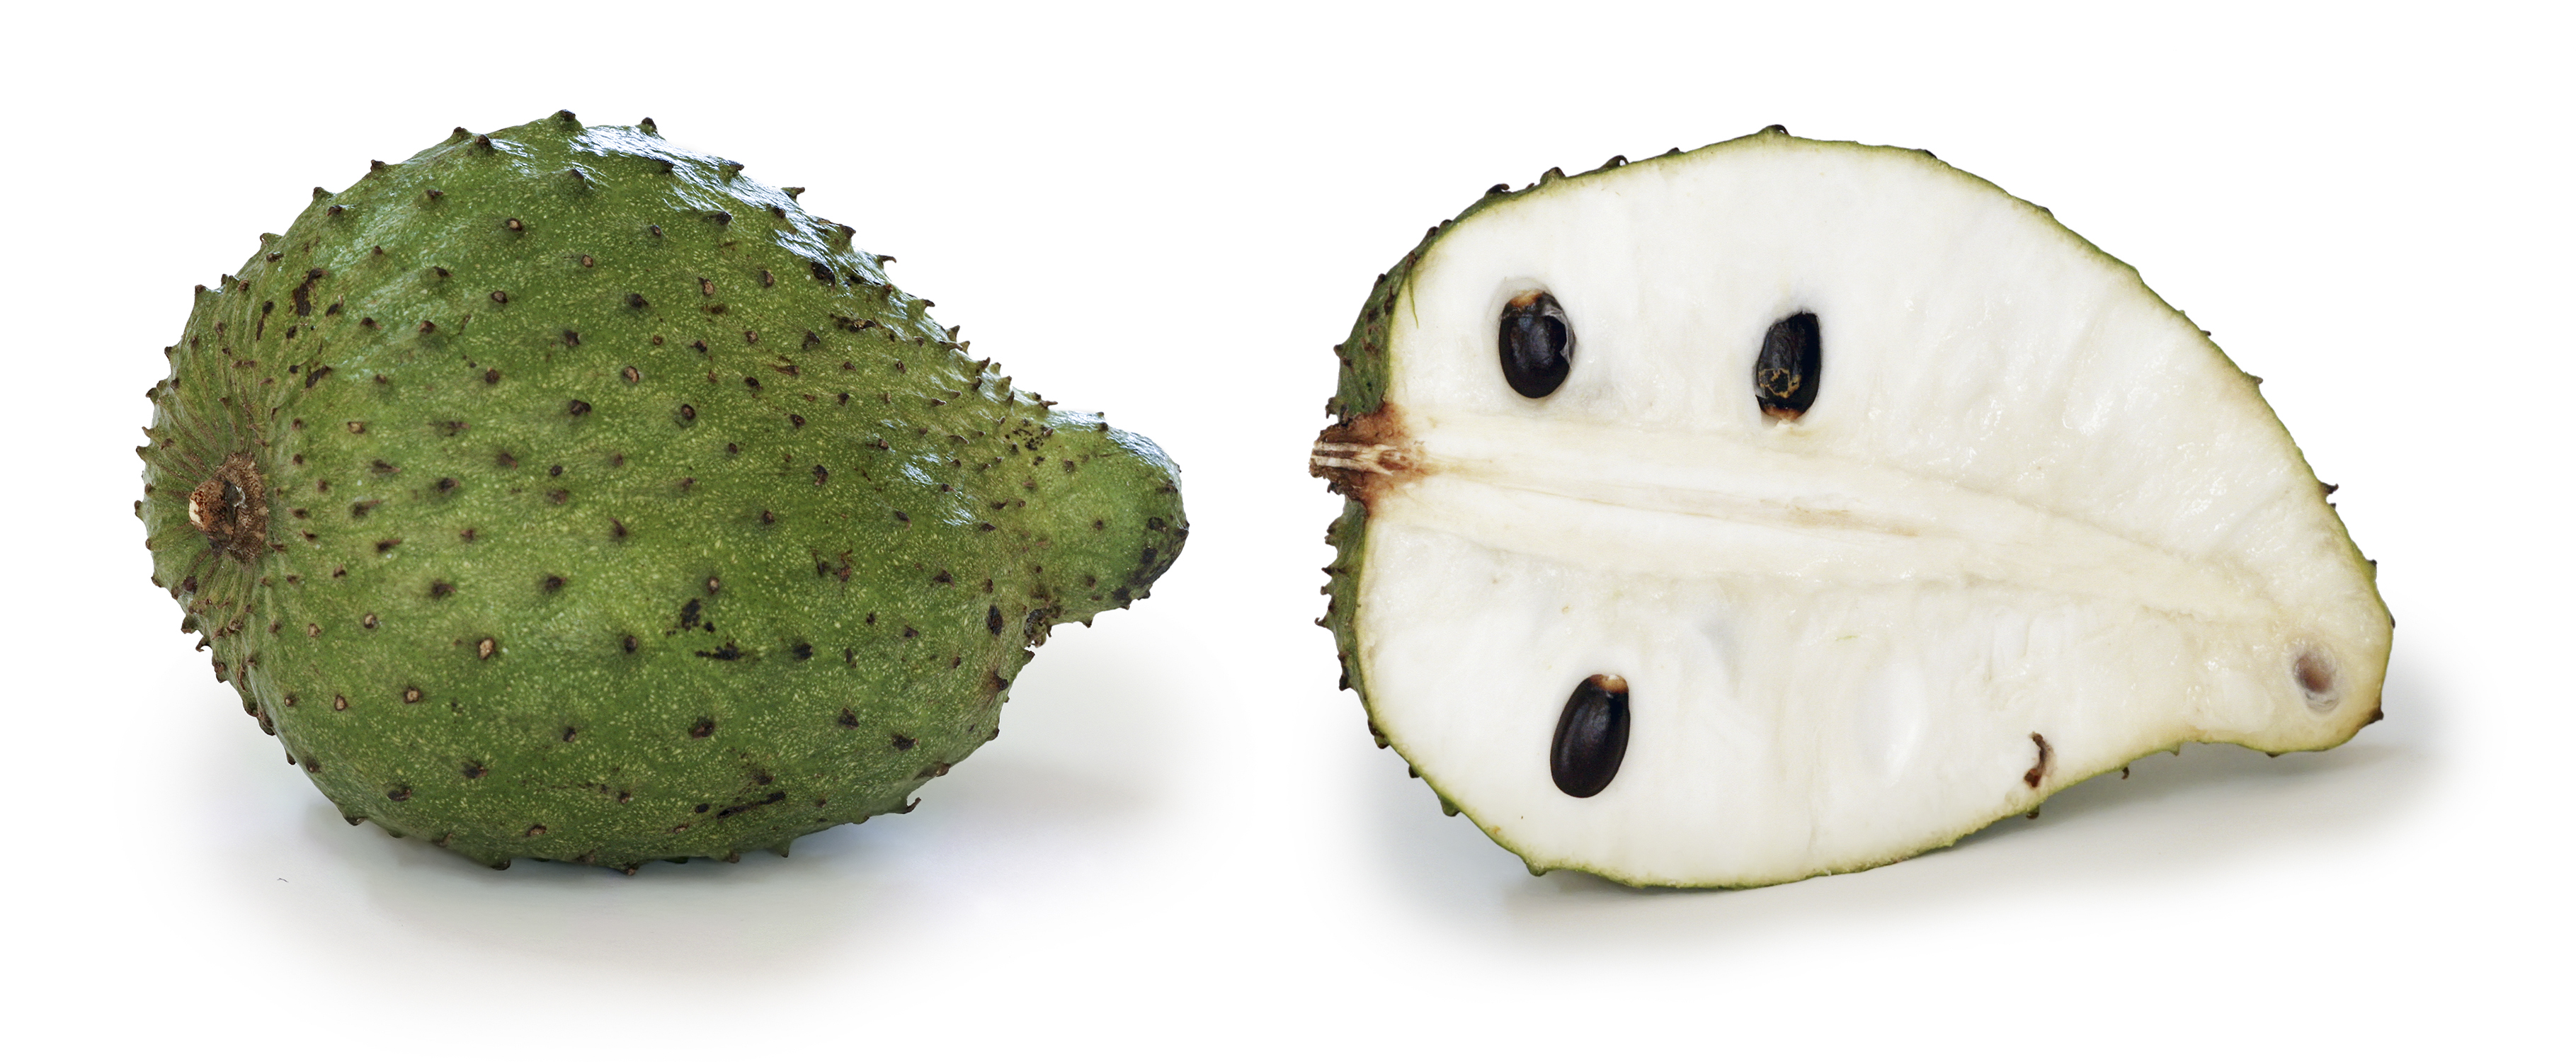 muricata fruit